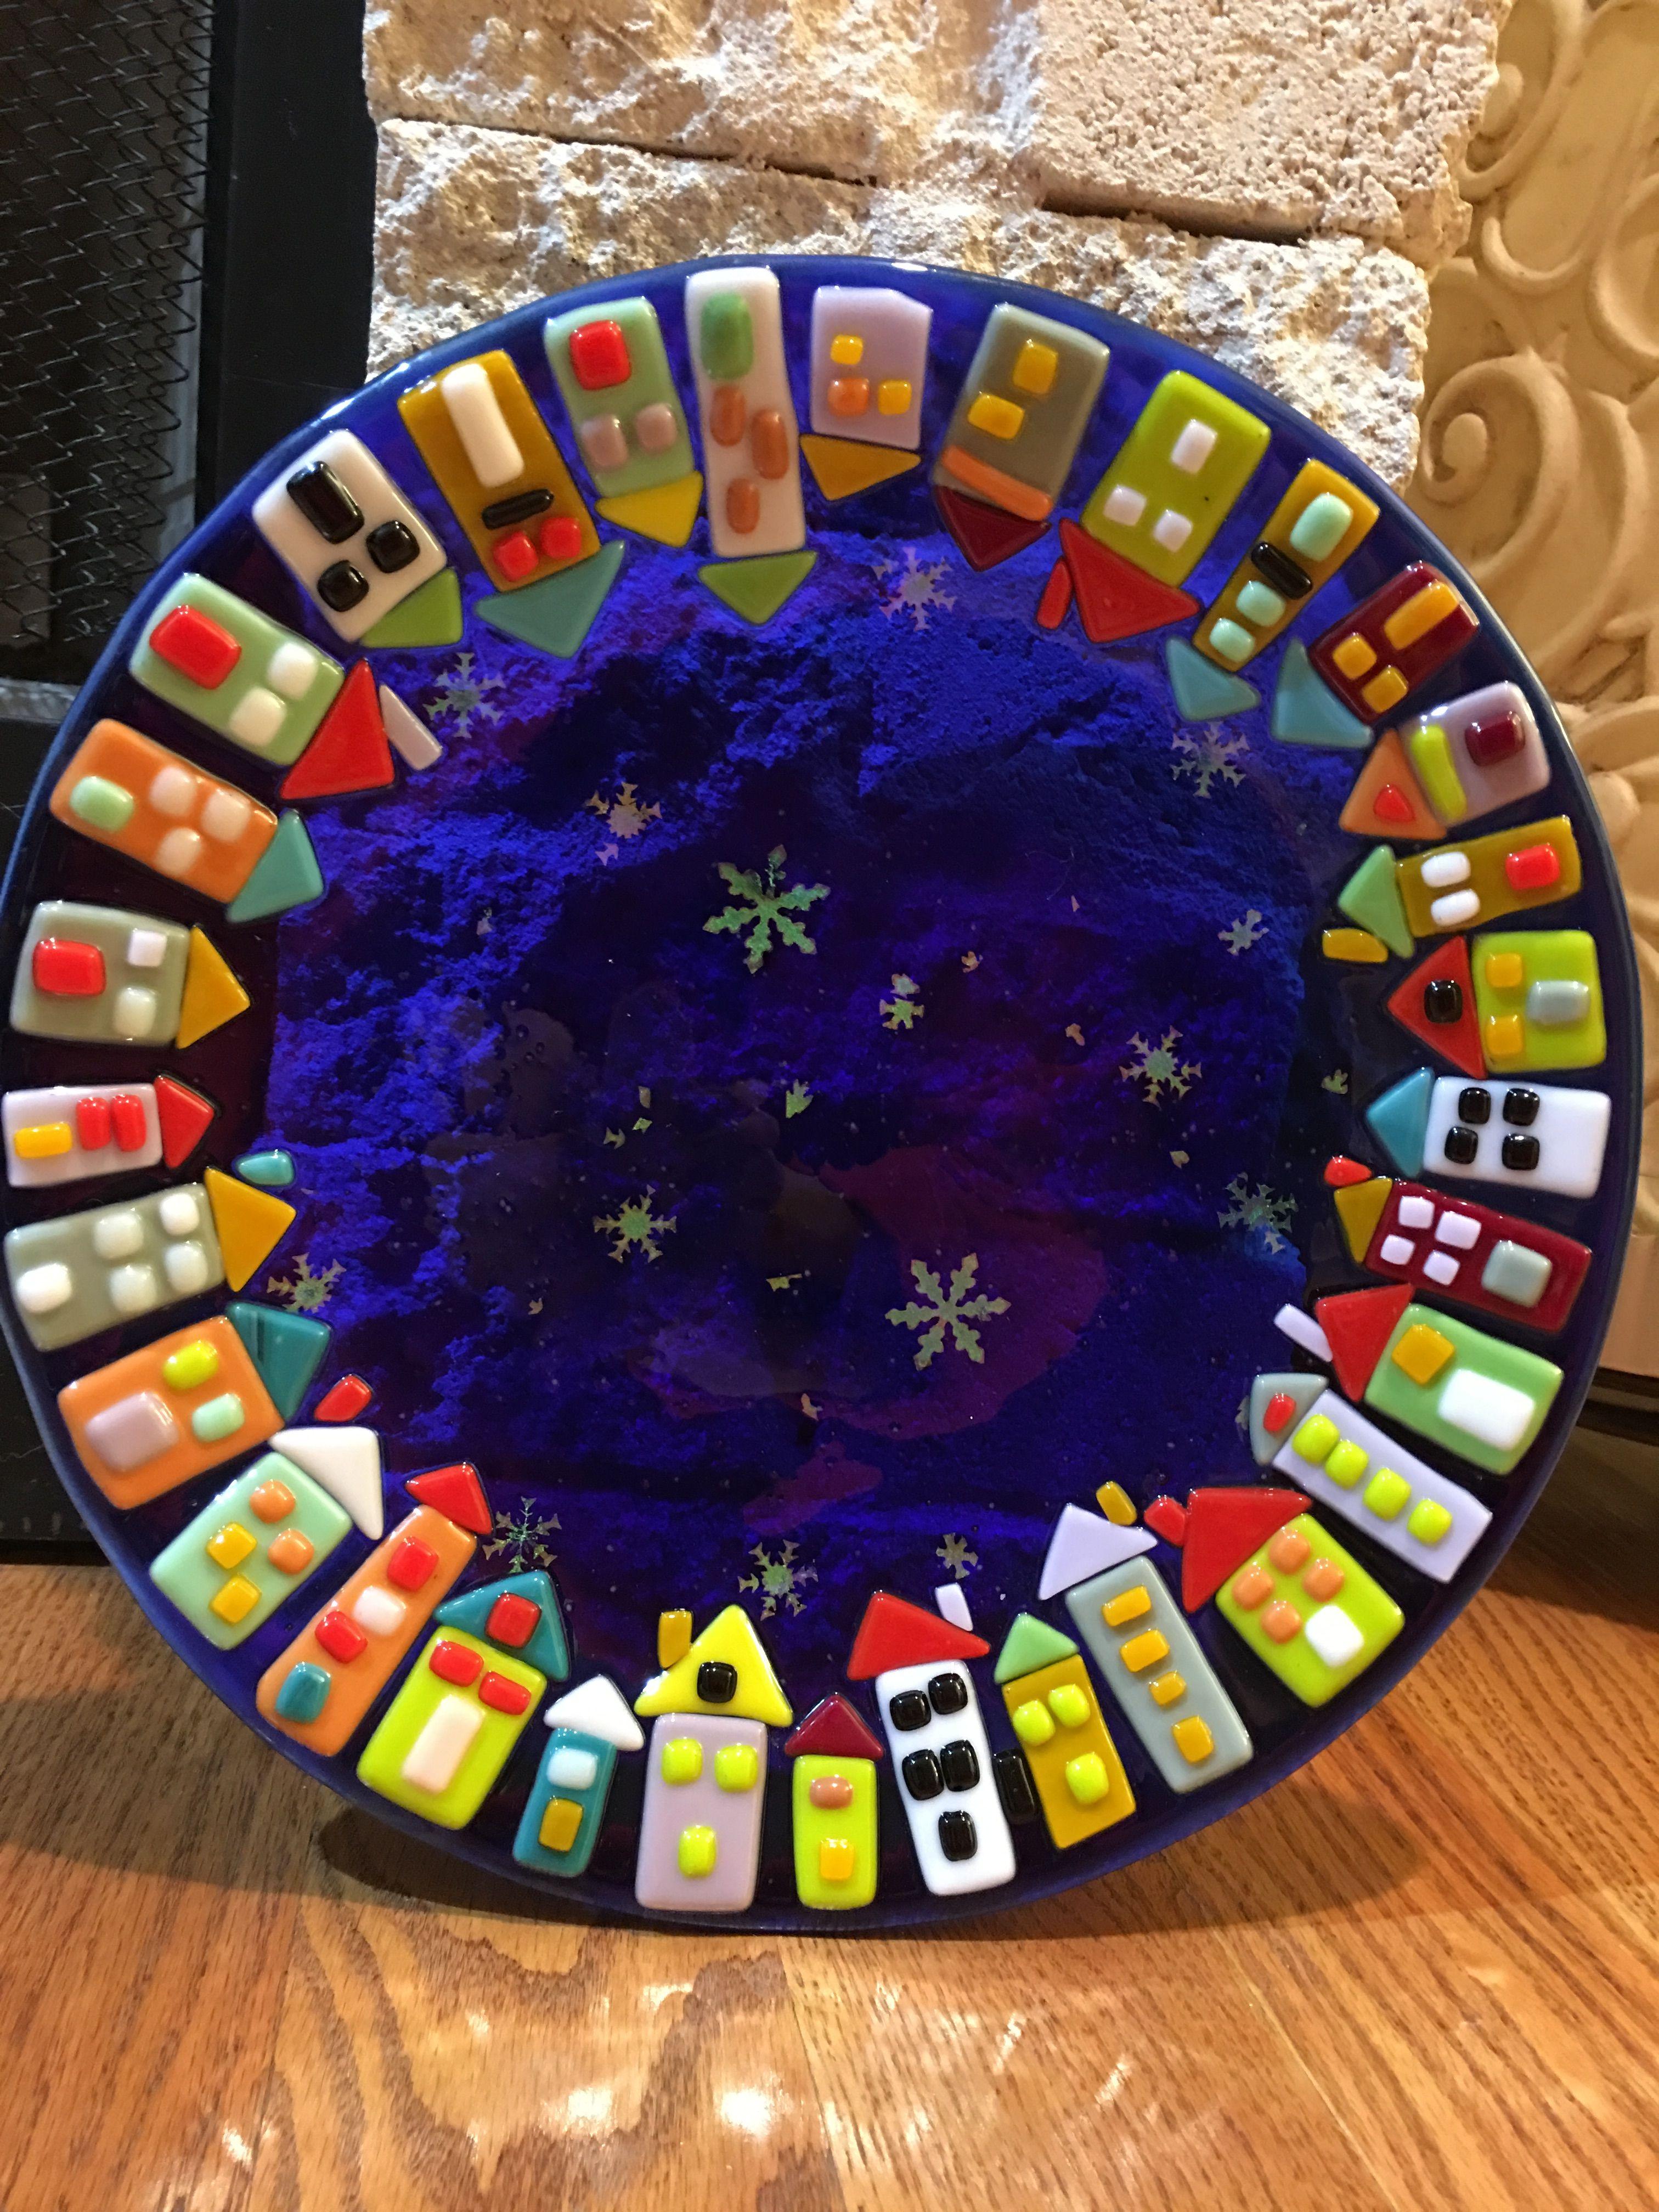 Fused glass bowl fused glass art glass fusion ideas